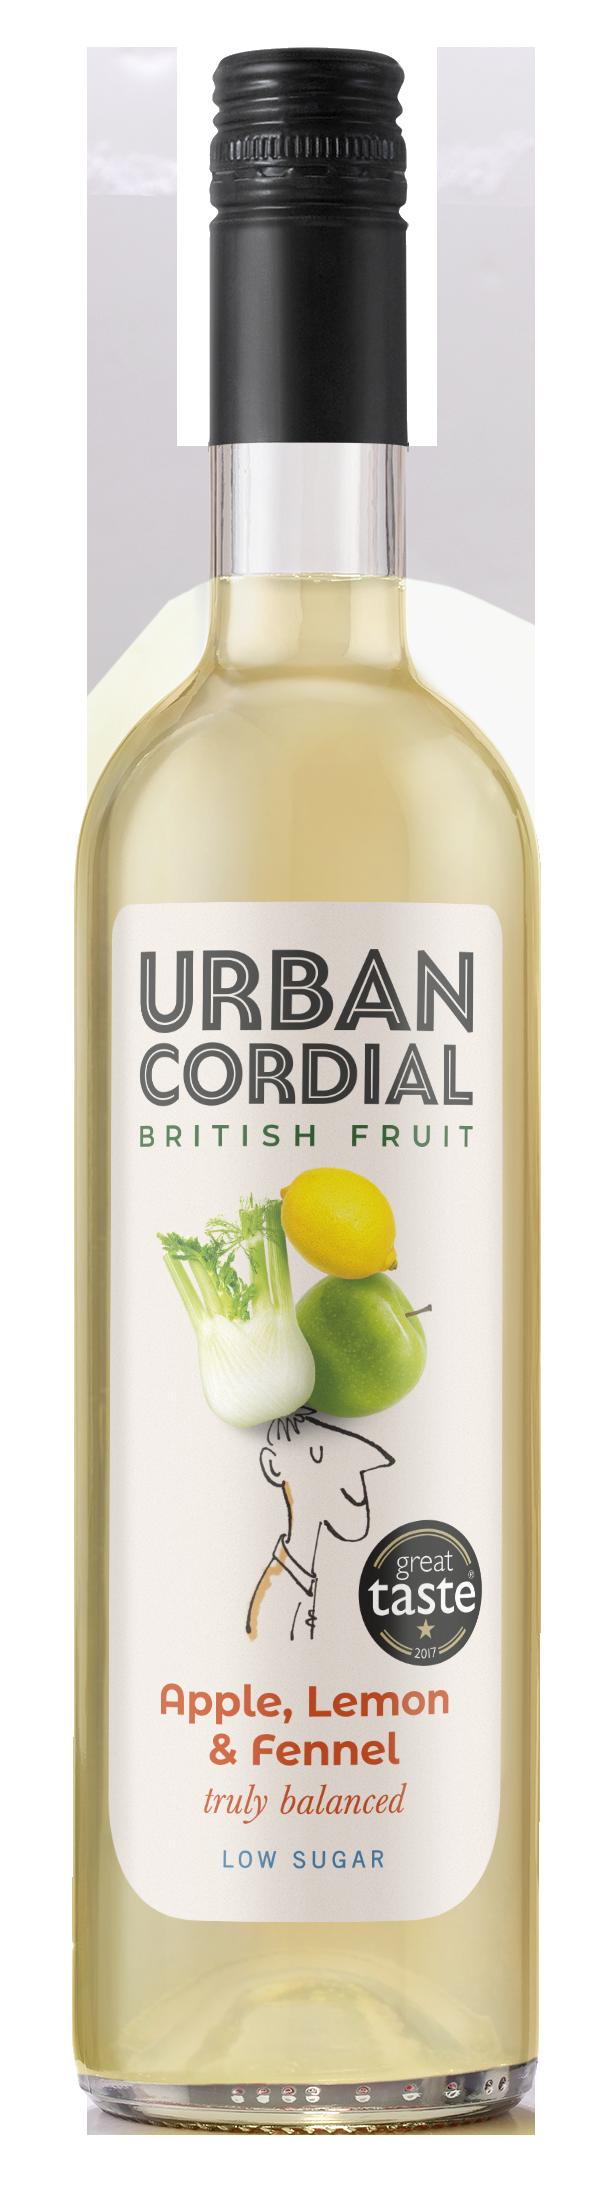 Apple, Lemon & Fennel Cordial from Urban Cordials 500ml